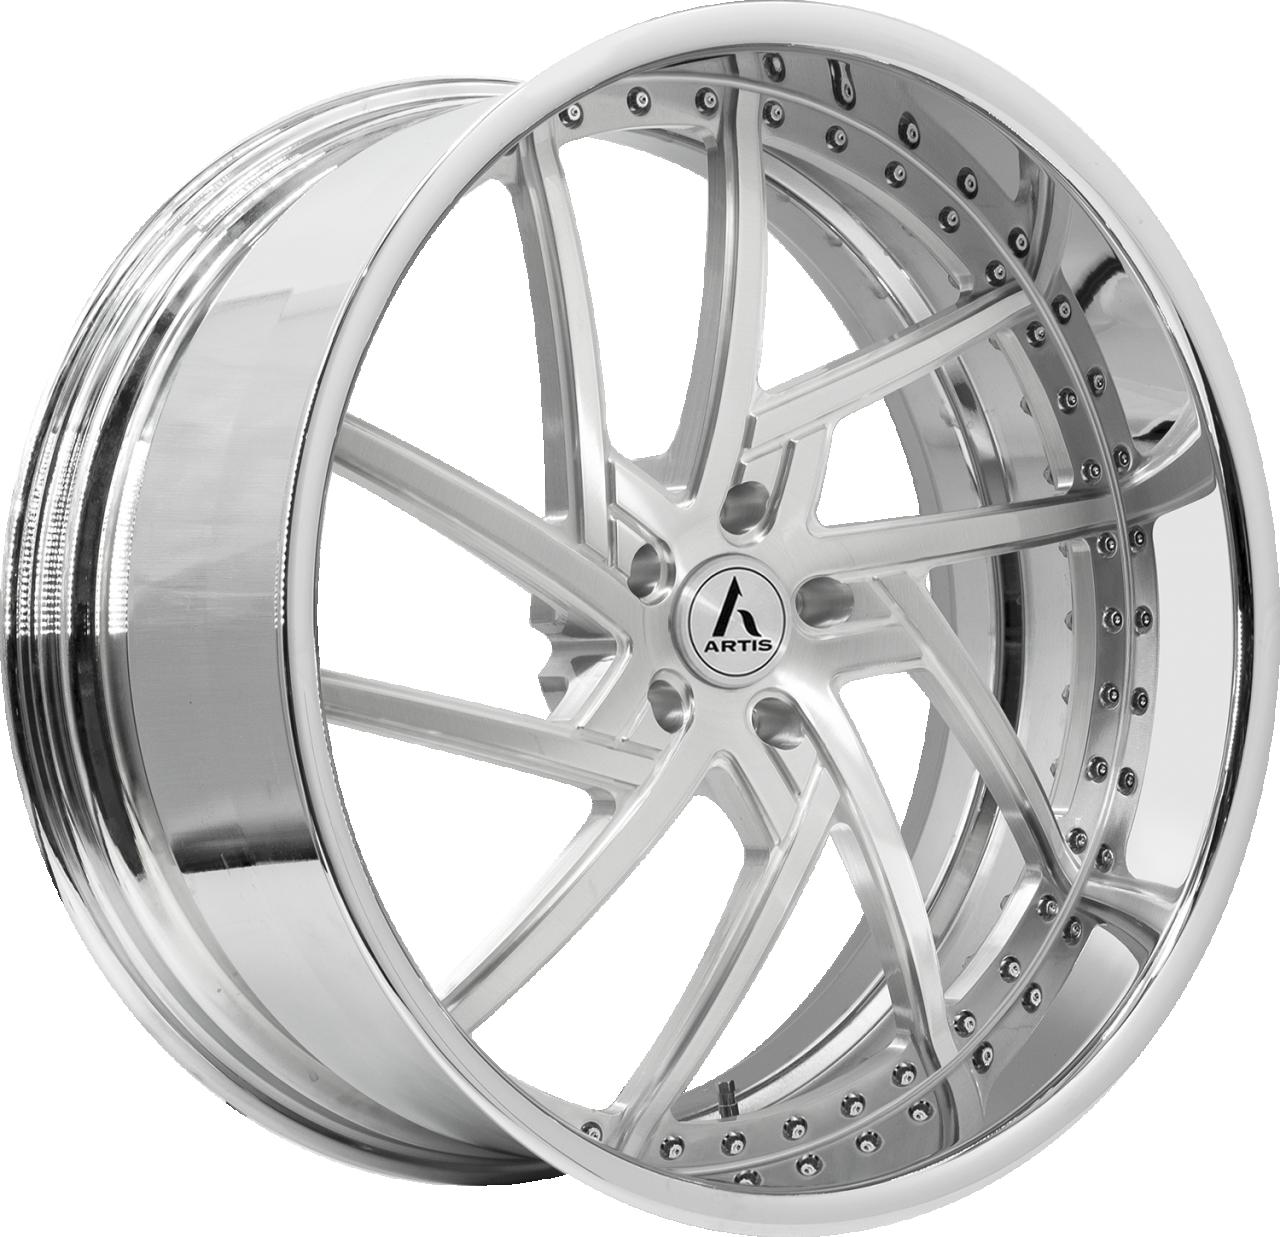 Artis Forged Fairfax-M wheel with Brushed finish